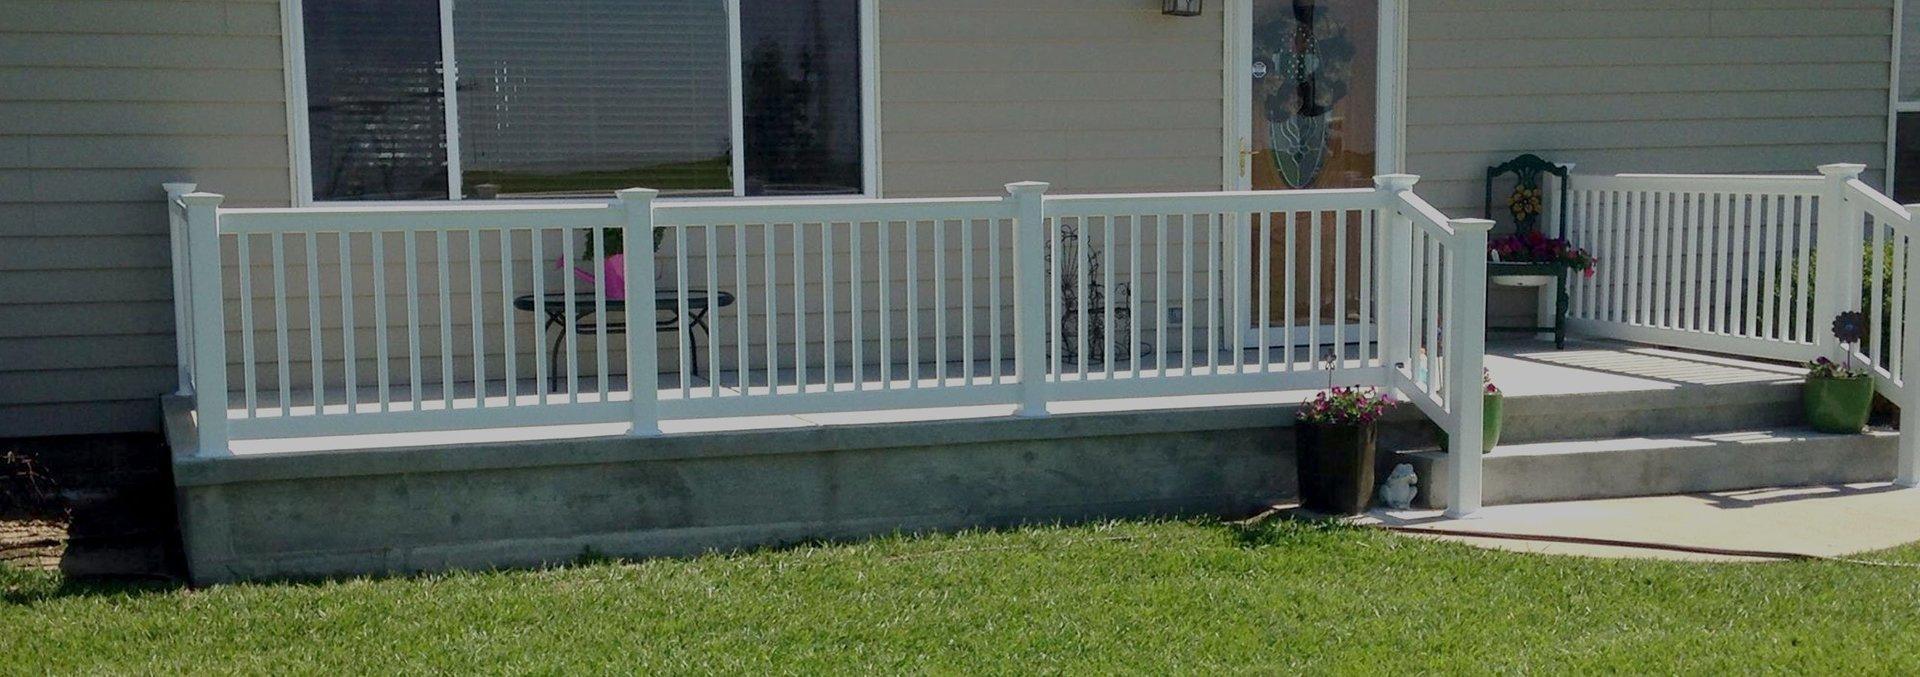 Denton Construction Llc Fences Dodge City Ks